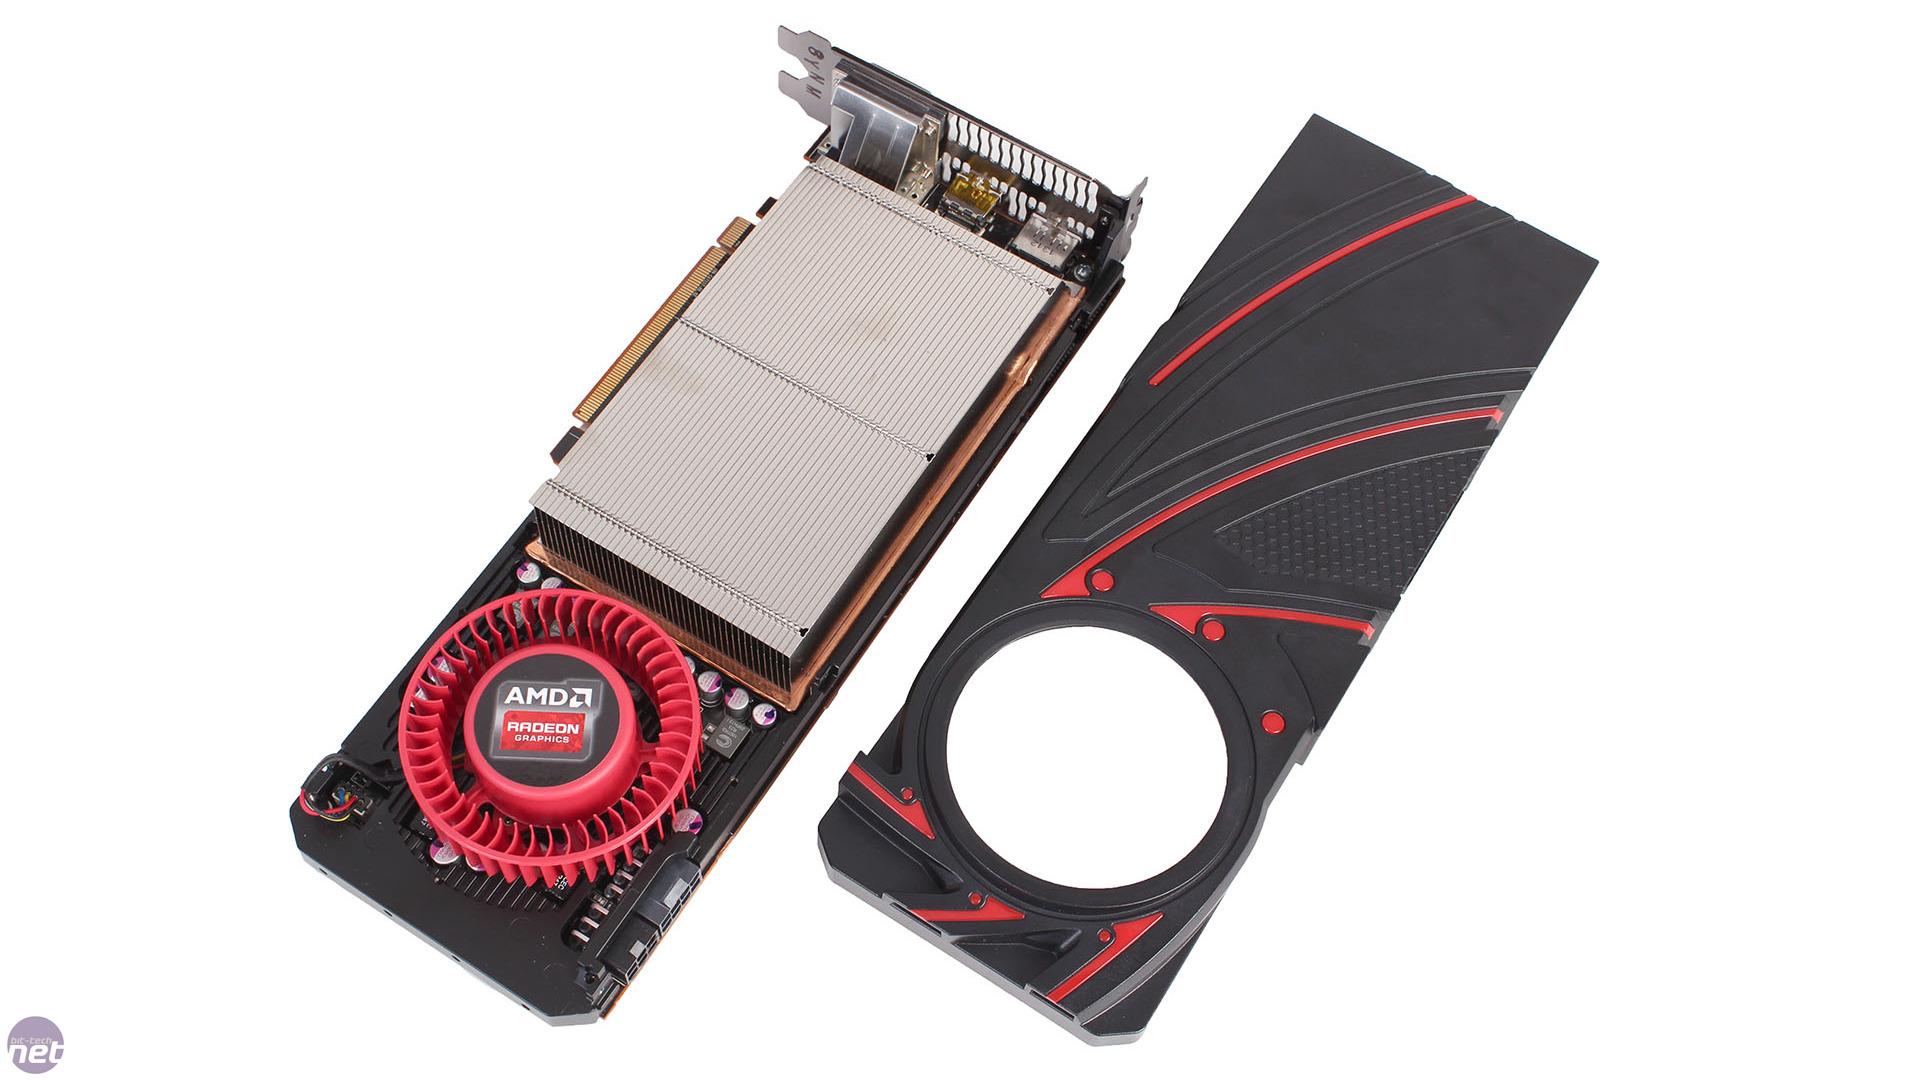 AMD Radeon R9 290 Review | bit-tech net